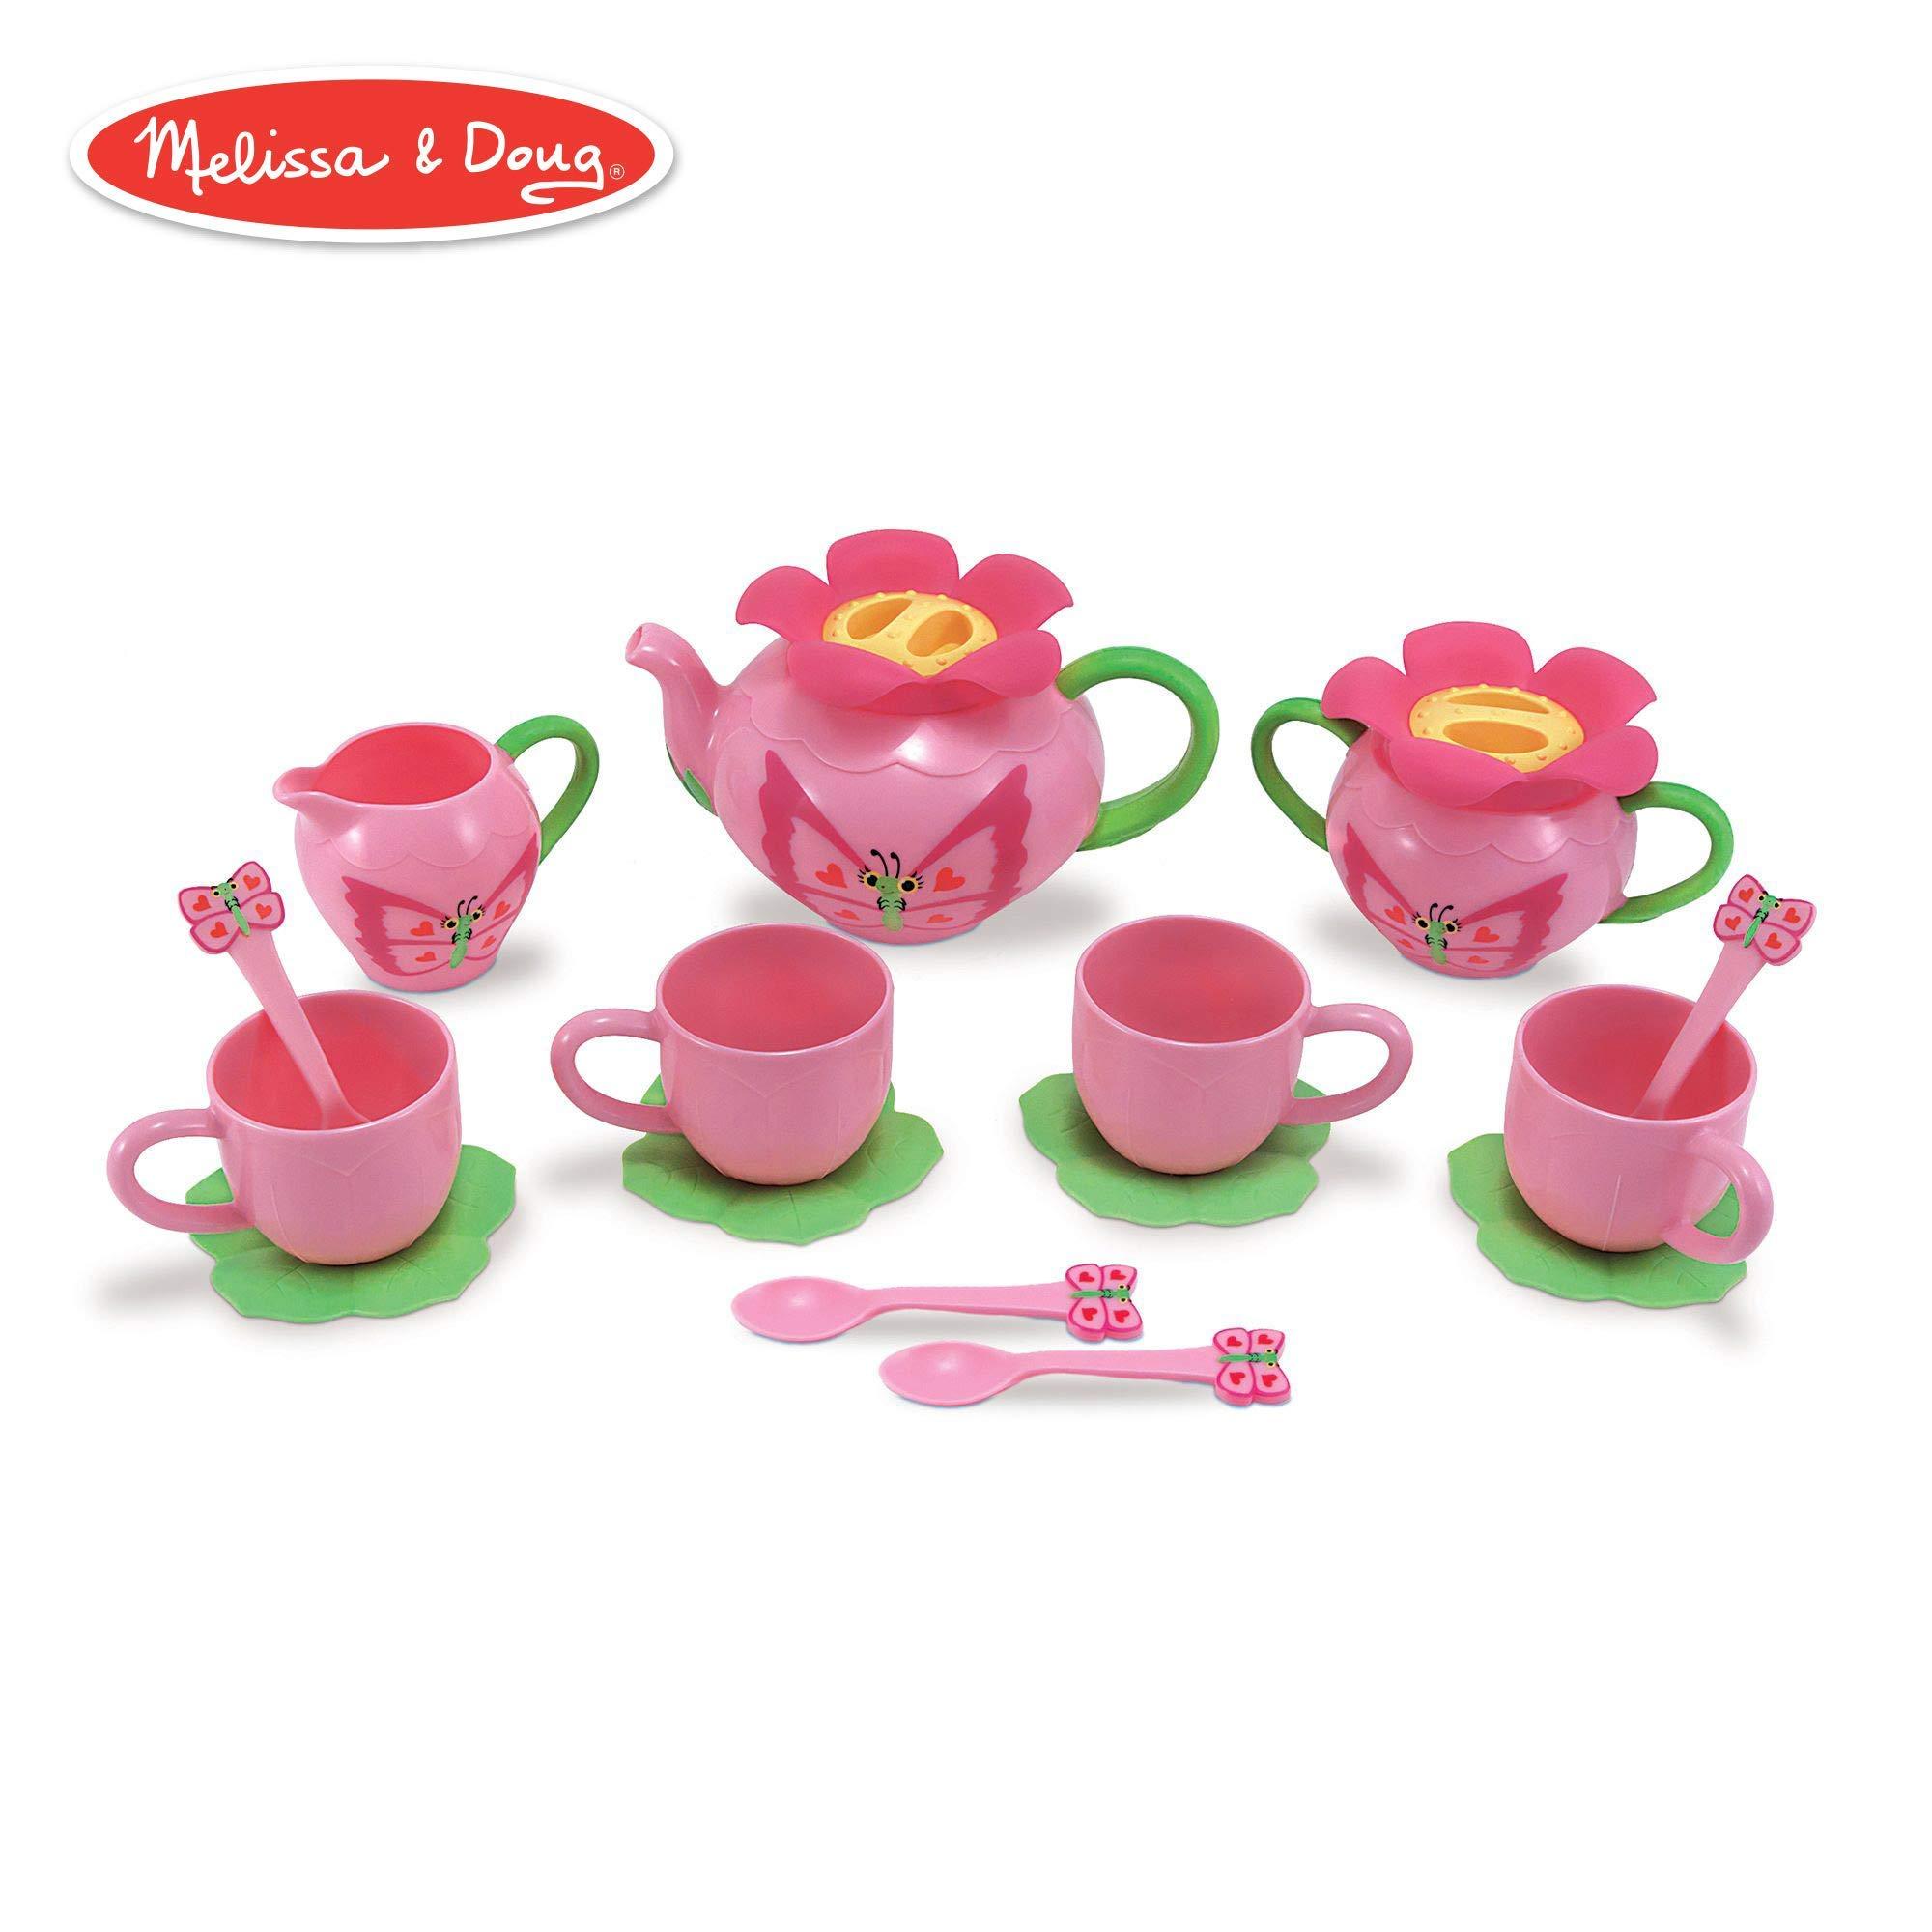 Melissa & Doug Bella Butterfly Pretend Play Tea Set (Pretend Play, Food-Safe Material, BPA-Free, Durable Construction, 15.5'' H x 12'' W x 4.5'' L) (Renewed)